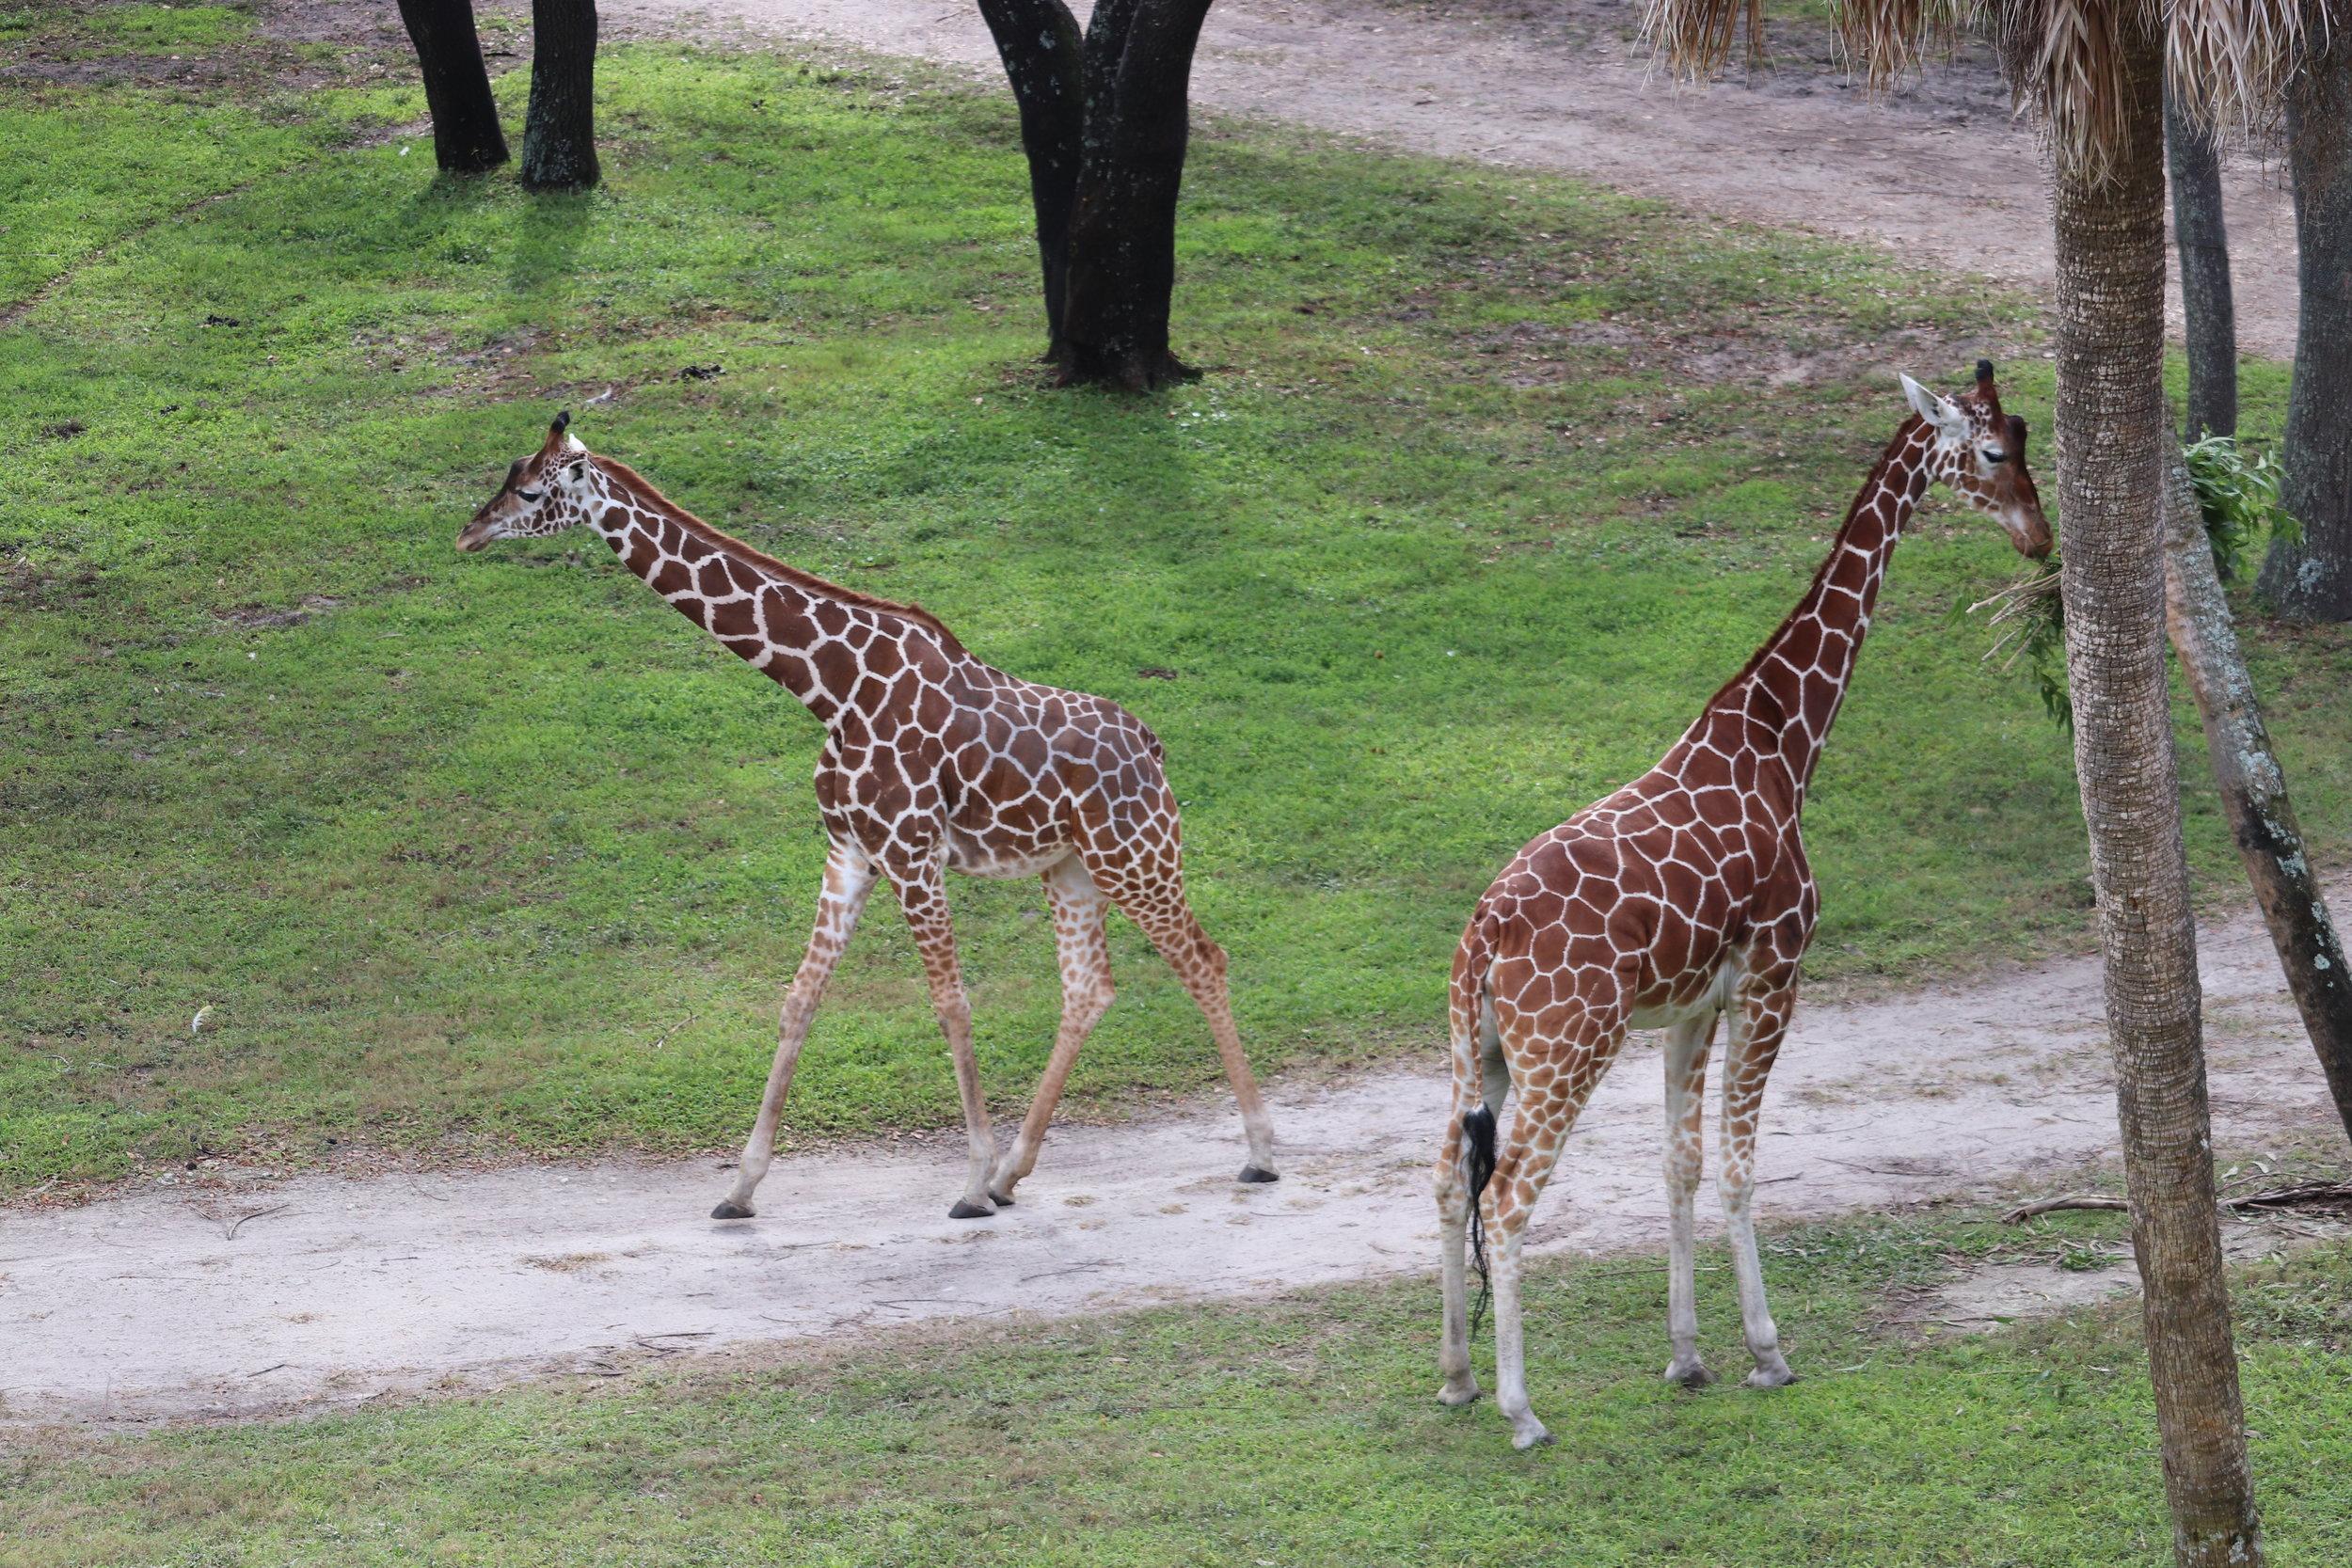 You can see so many animals at Animal Kingdom Lodge.